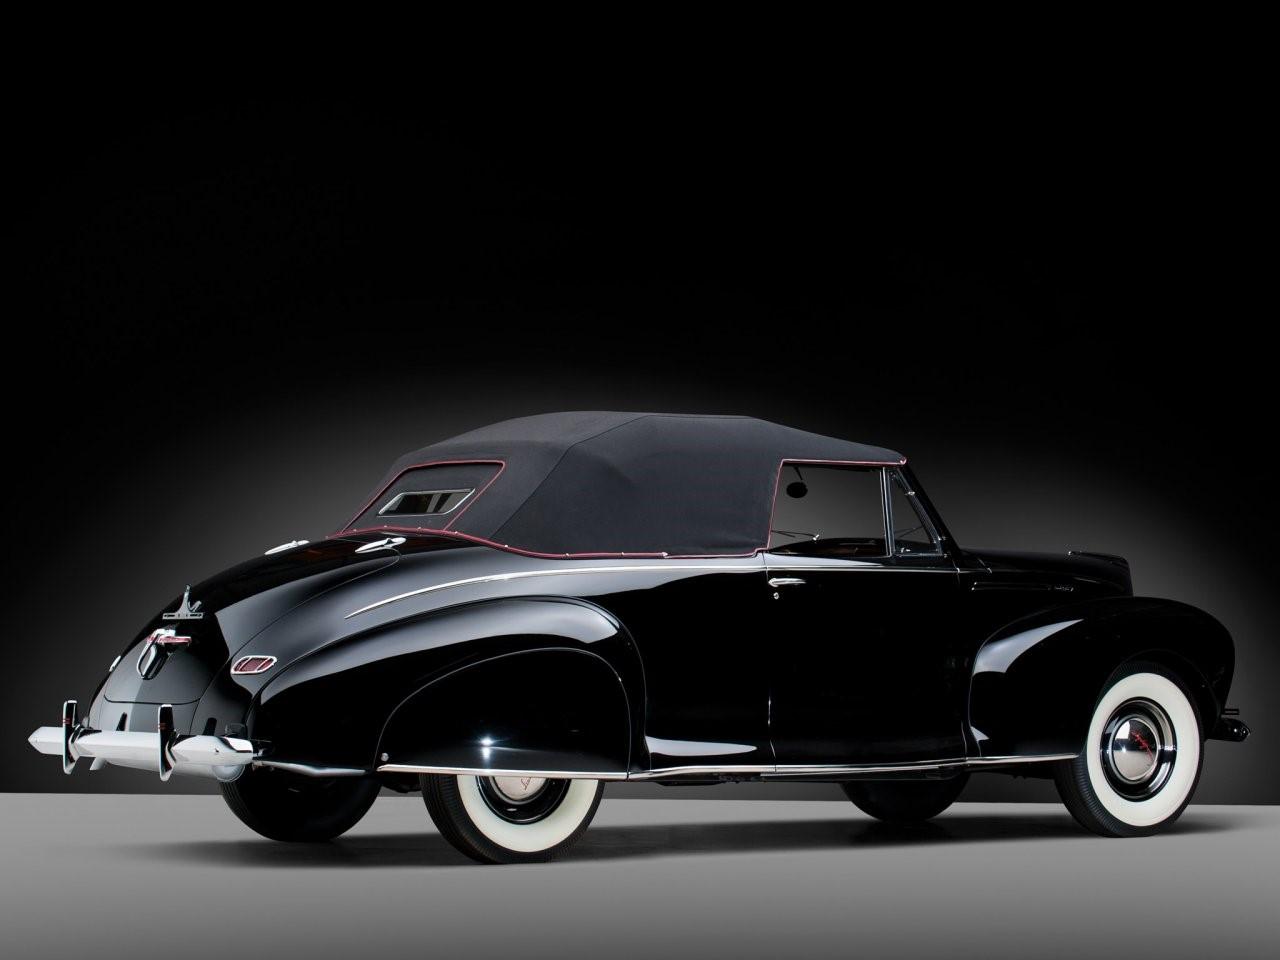 1939 Lincoln Zephyr 5